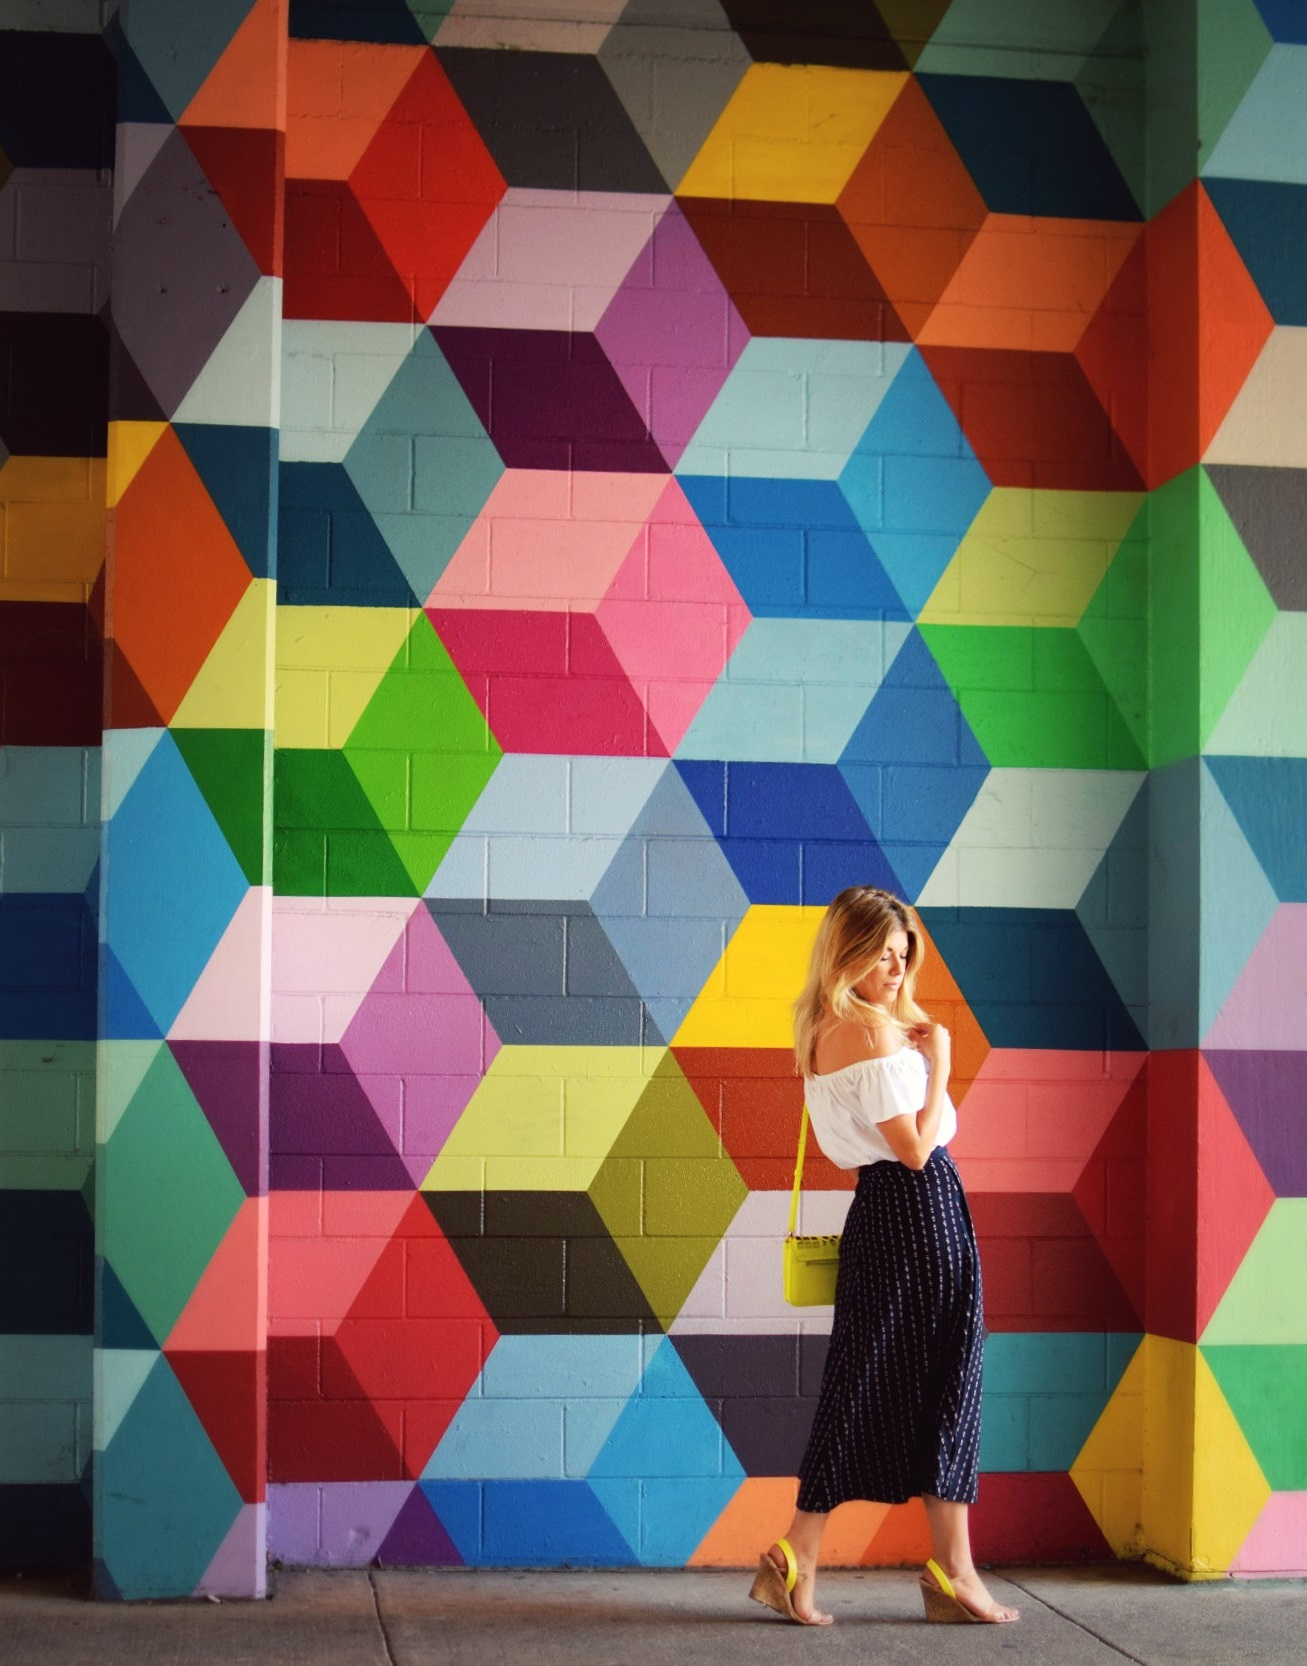 West_Village_colorful_rainbow_mural_vertical